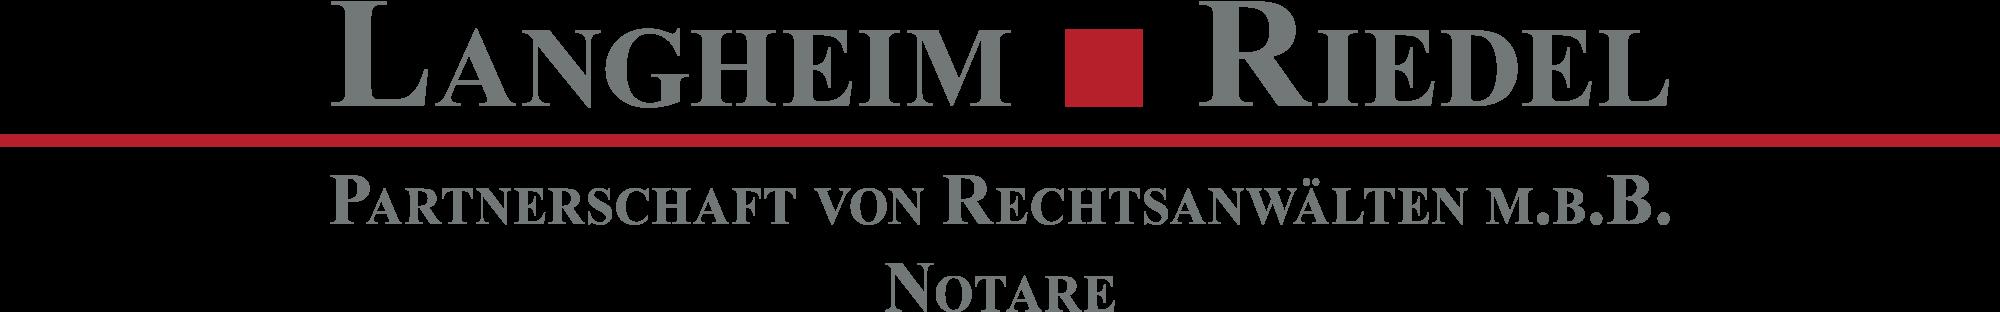 LangheimRiedel-Logo